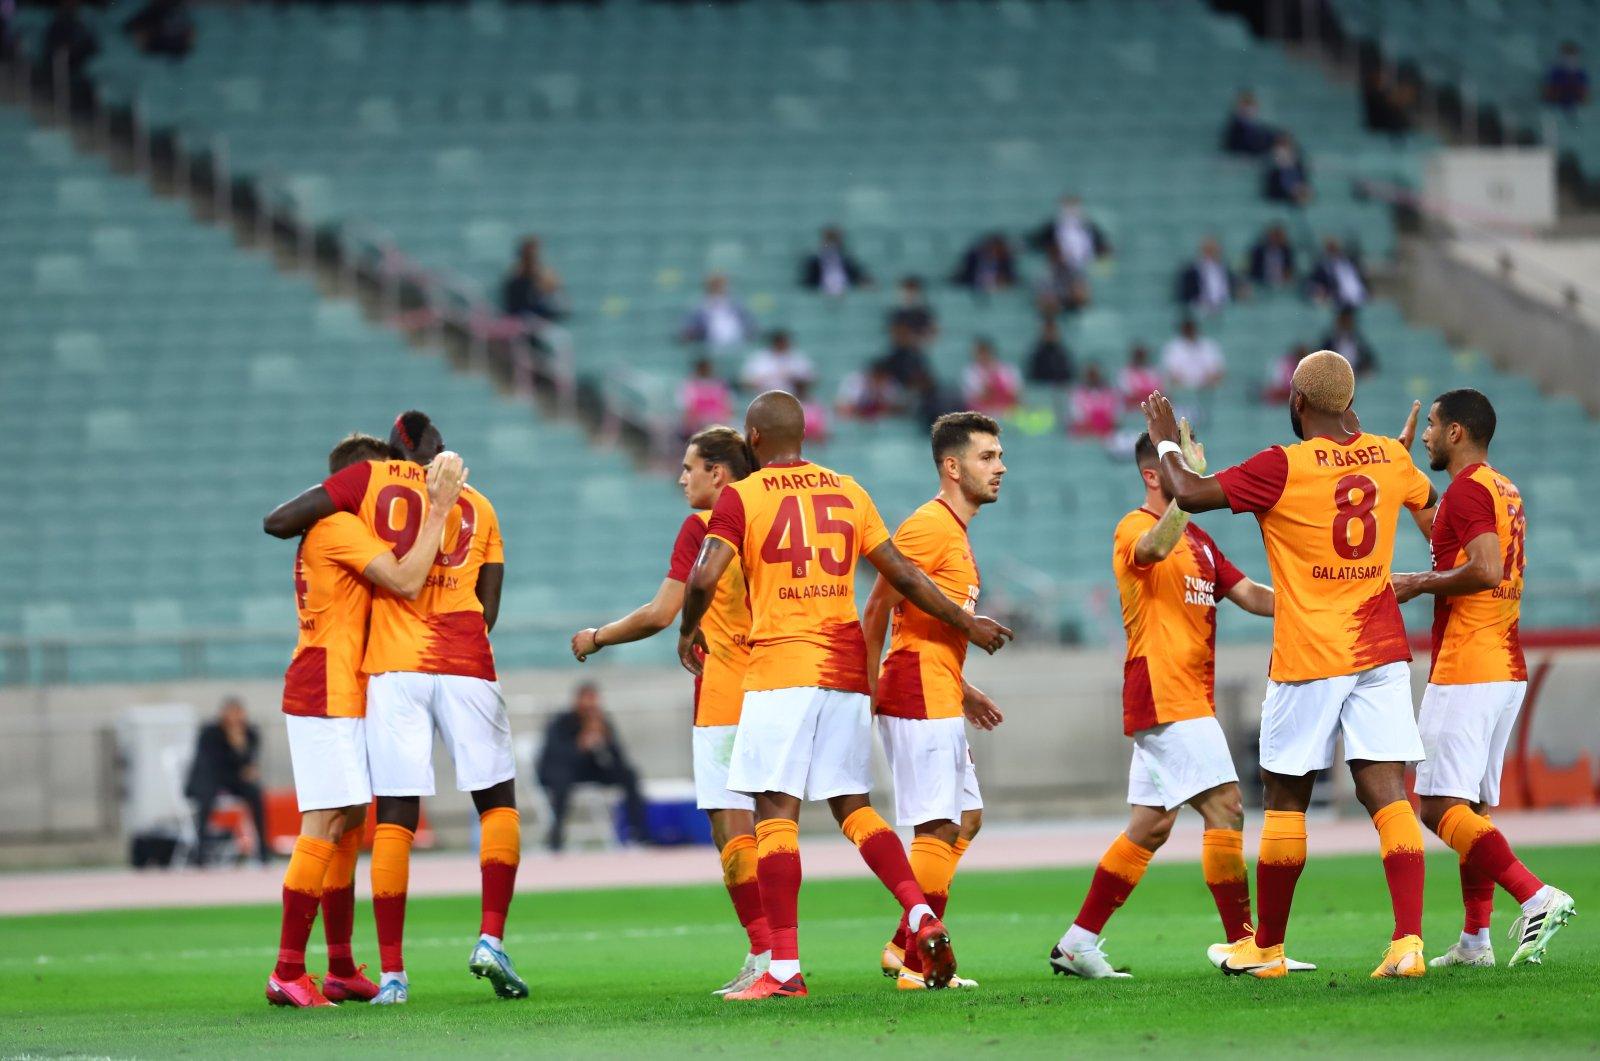 Galatasaray players celebrate a goal against Neftçi during a Europa League match in Baku, Azerbaijan, Sept. 17, 2020. (AA Photo)